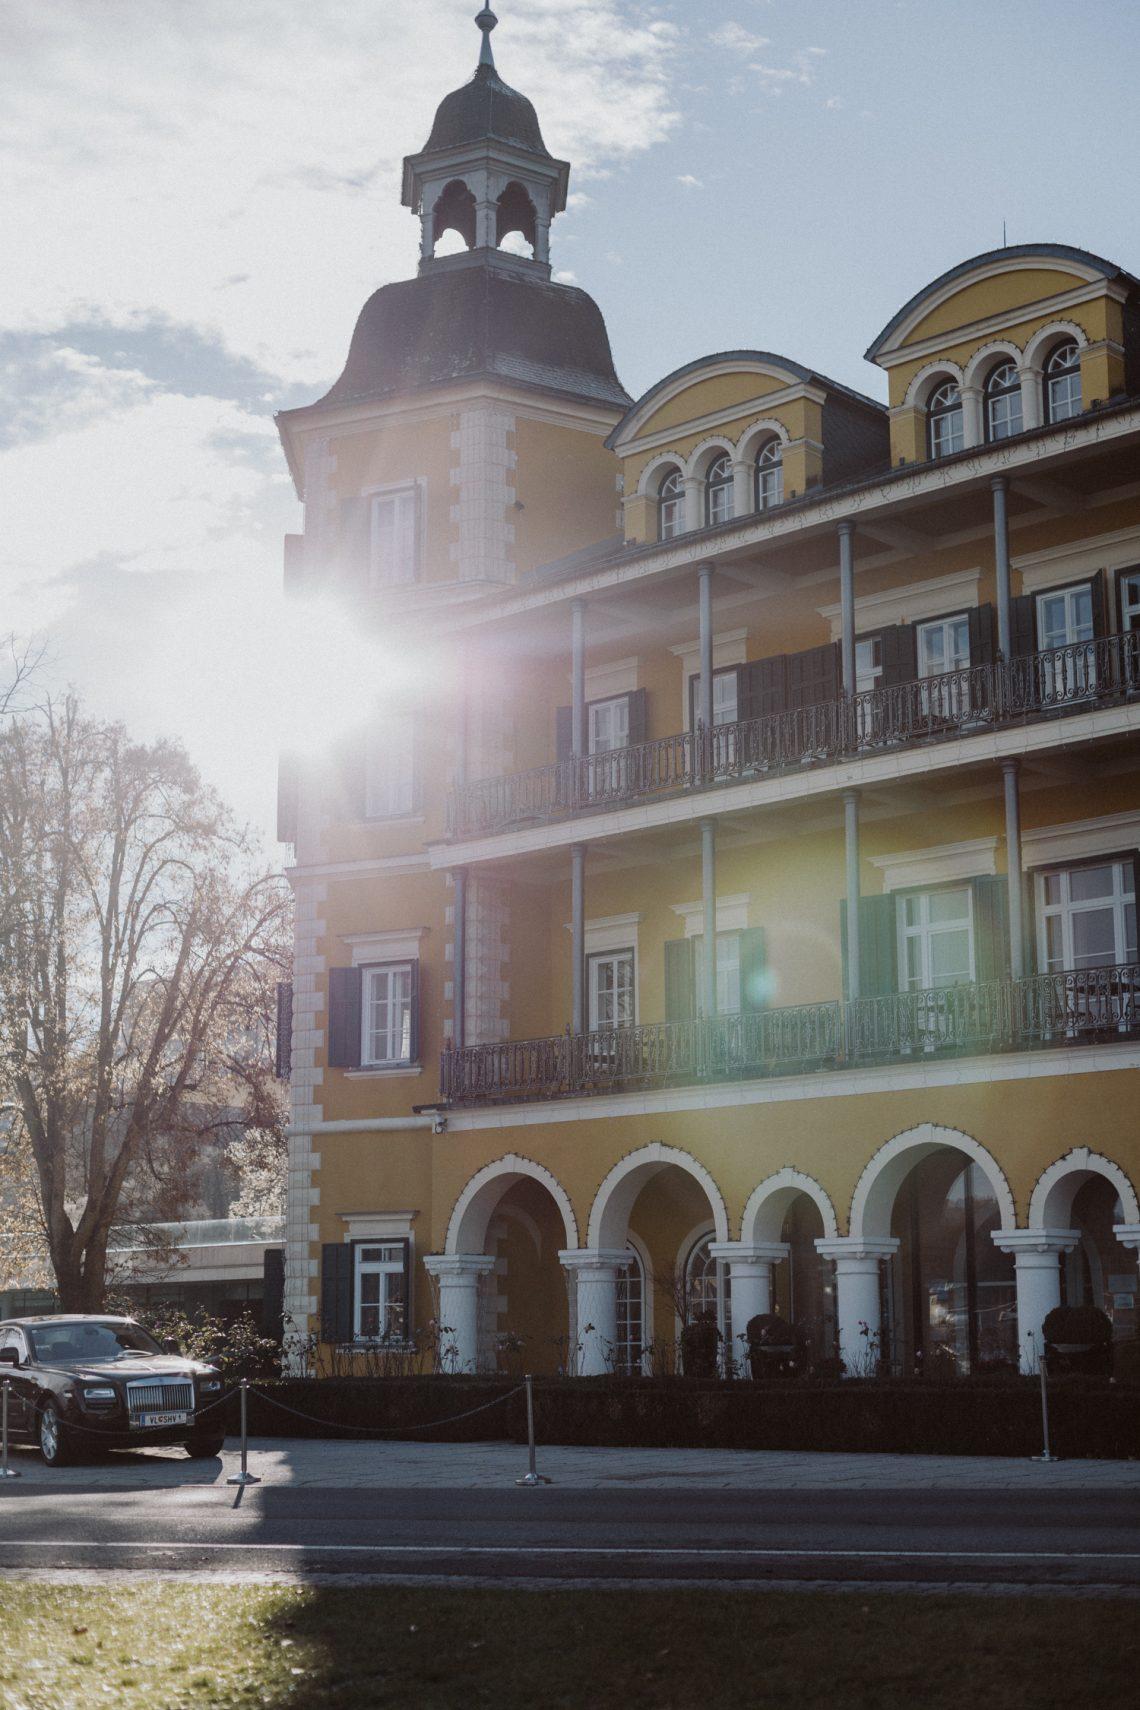 Travel Diary: Schlosshotel Velden